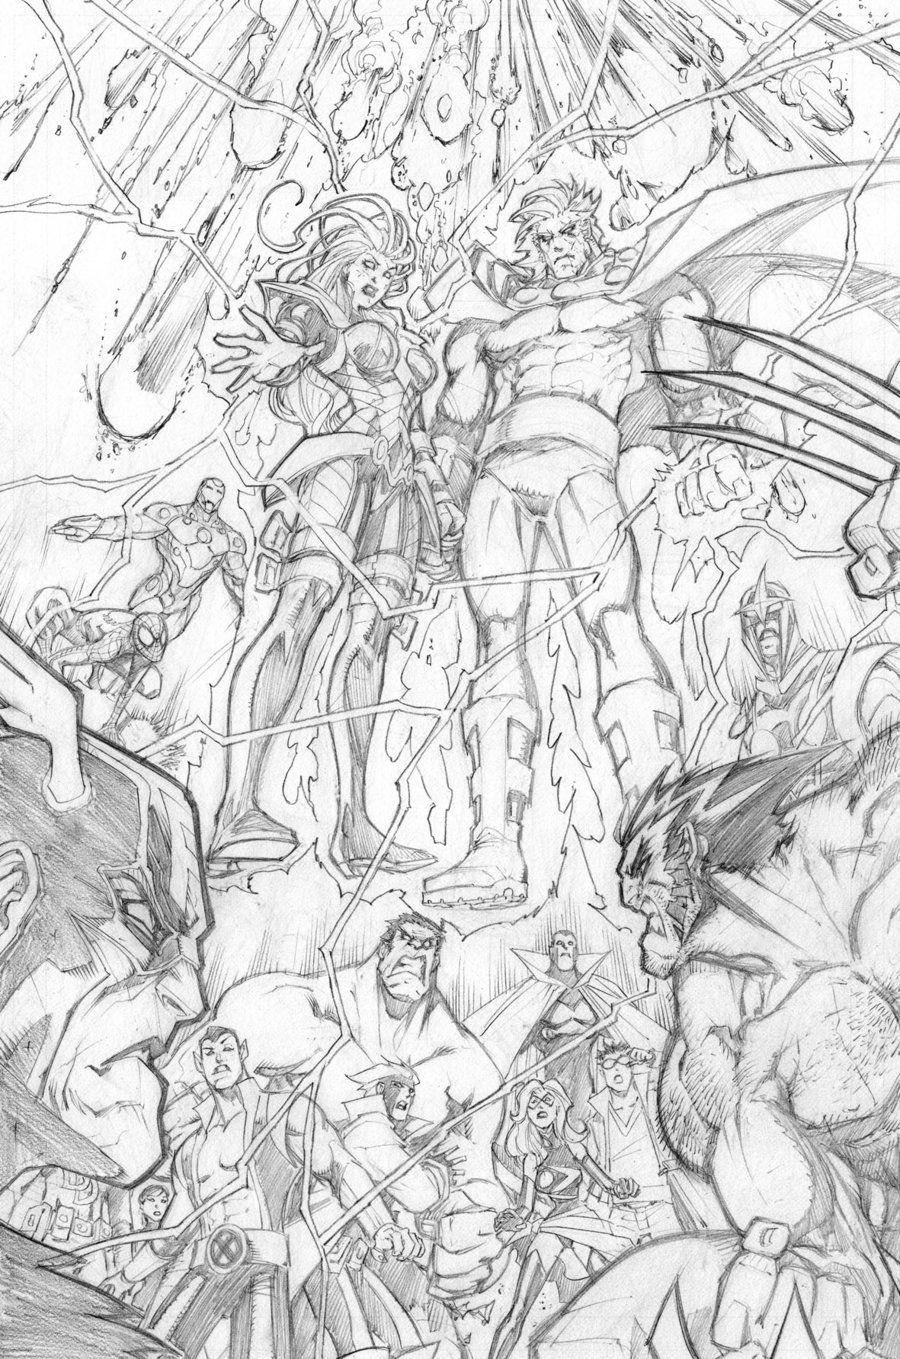 What If Avengers Vs X Men 3 Page 20 Pencils By Sandoval Art On Deviantart Marvel Art Marvel Coloring Comic Books Illustration